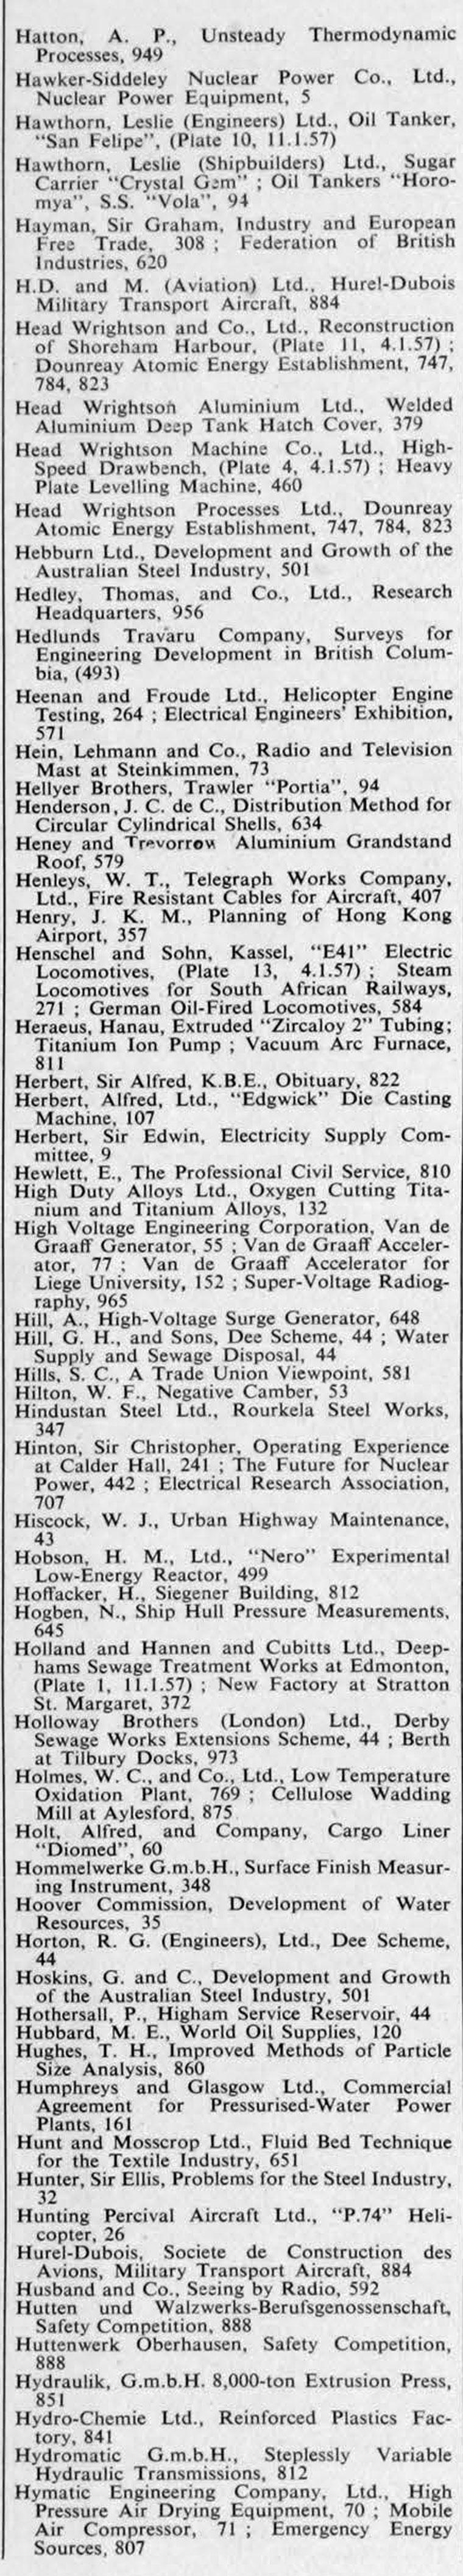 The Engineer 1957 Jan-Jun: Index